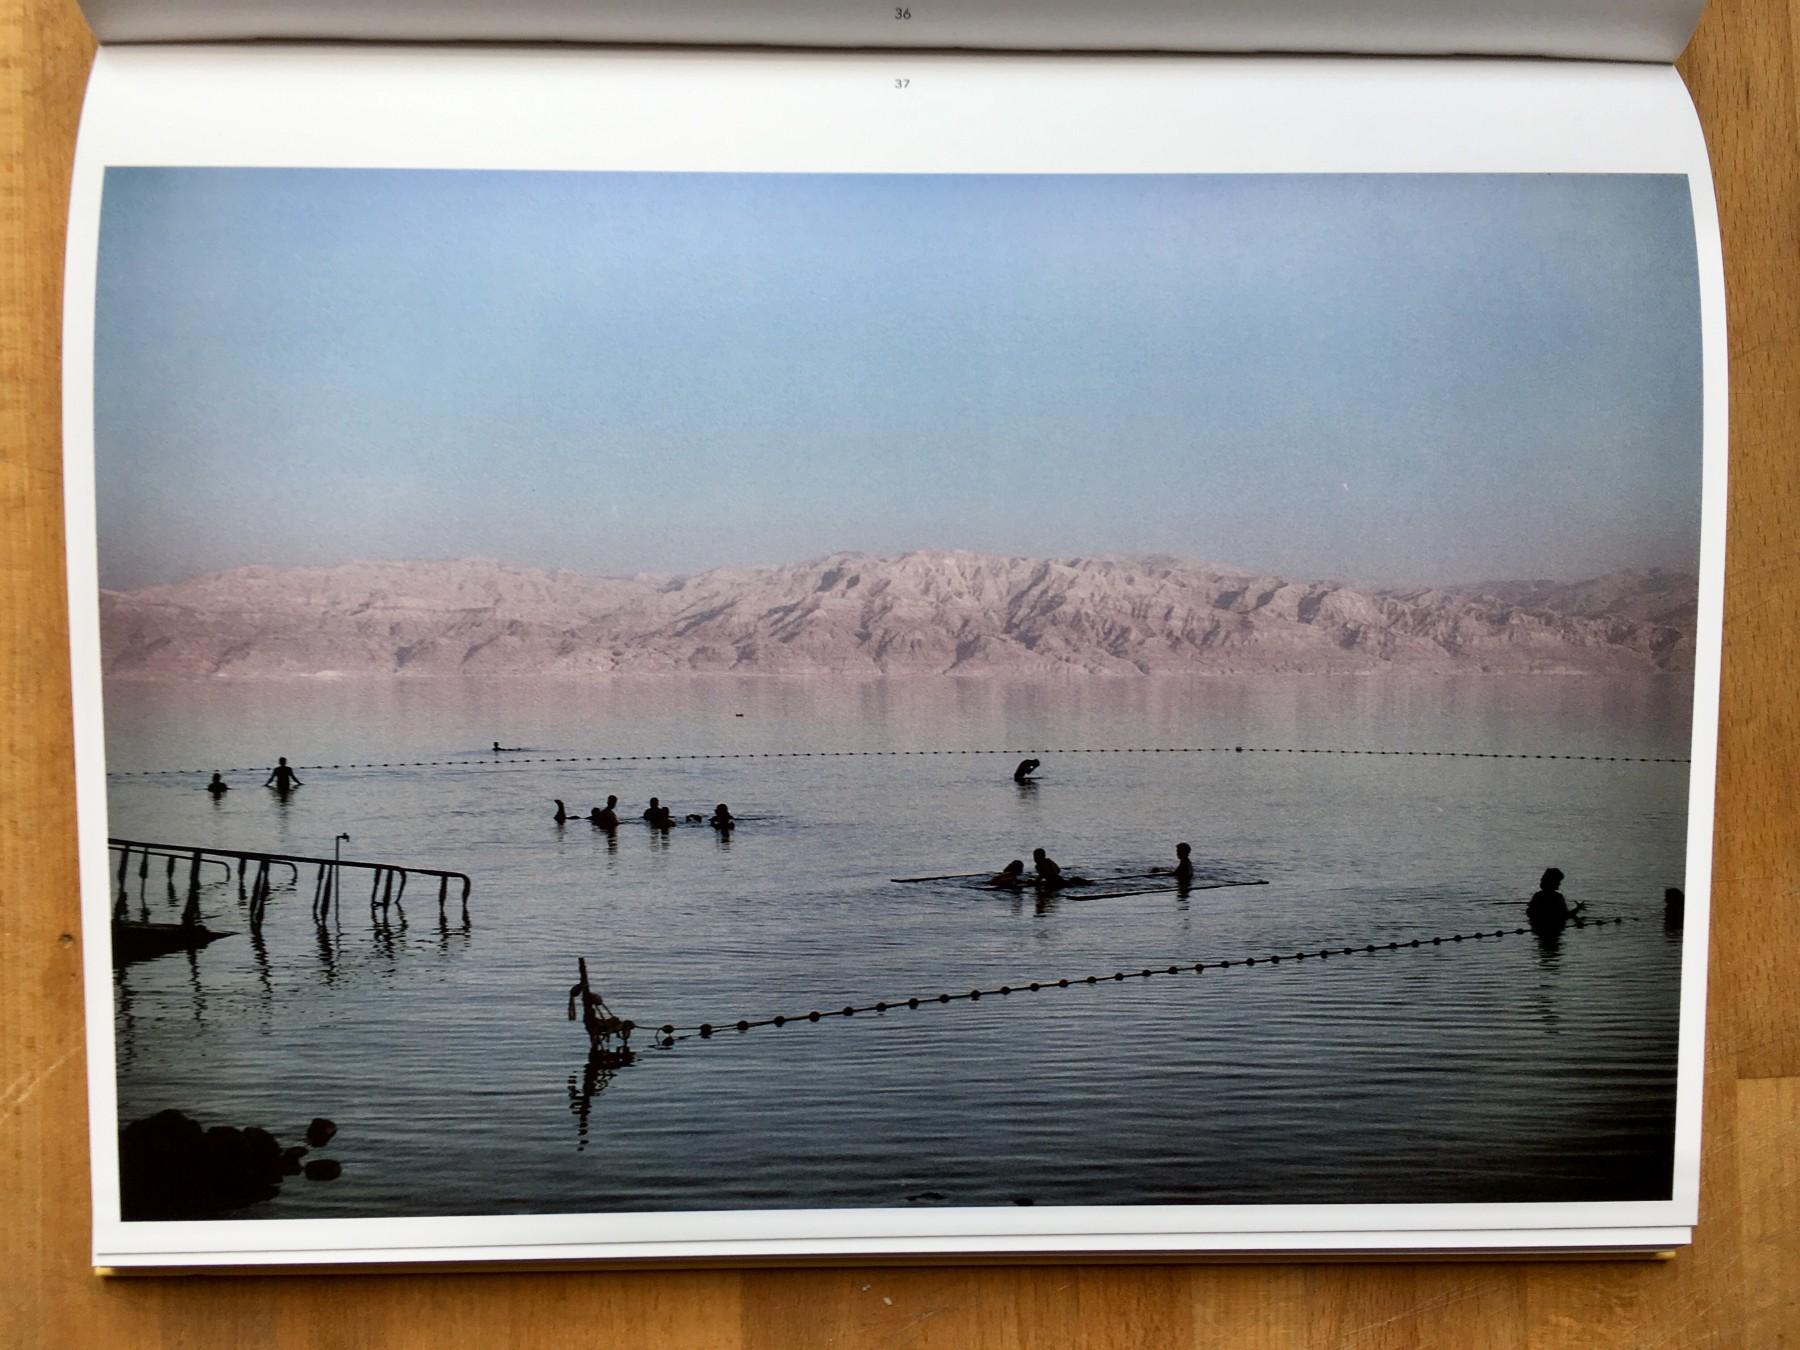 enster-blog-di-cultura-fotografica-harry-gruyaert-rivage-106.JPG